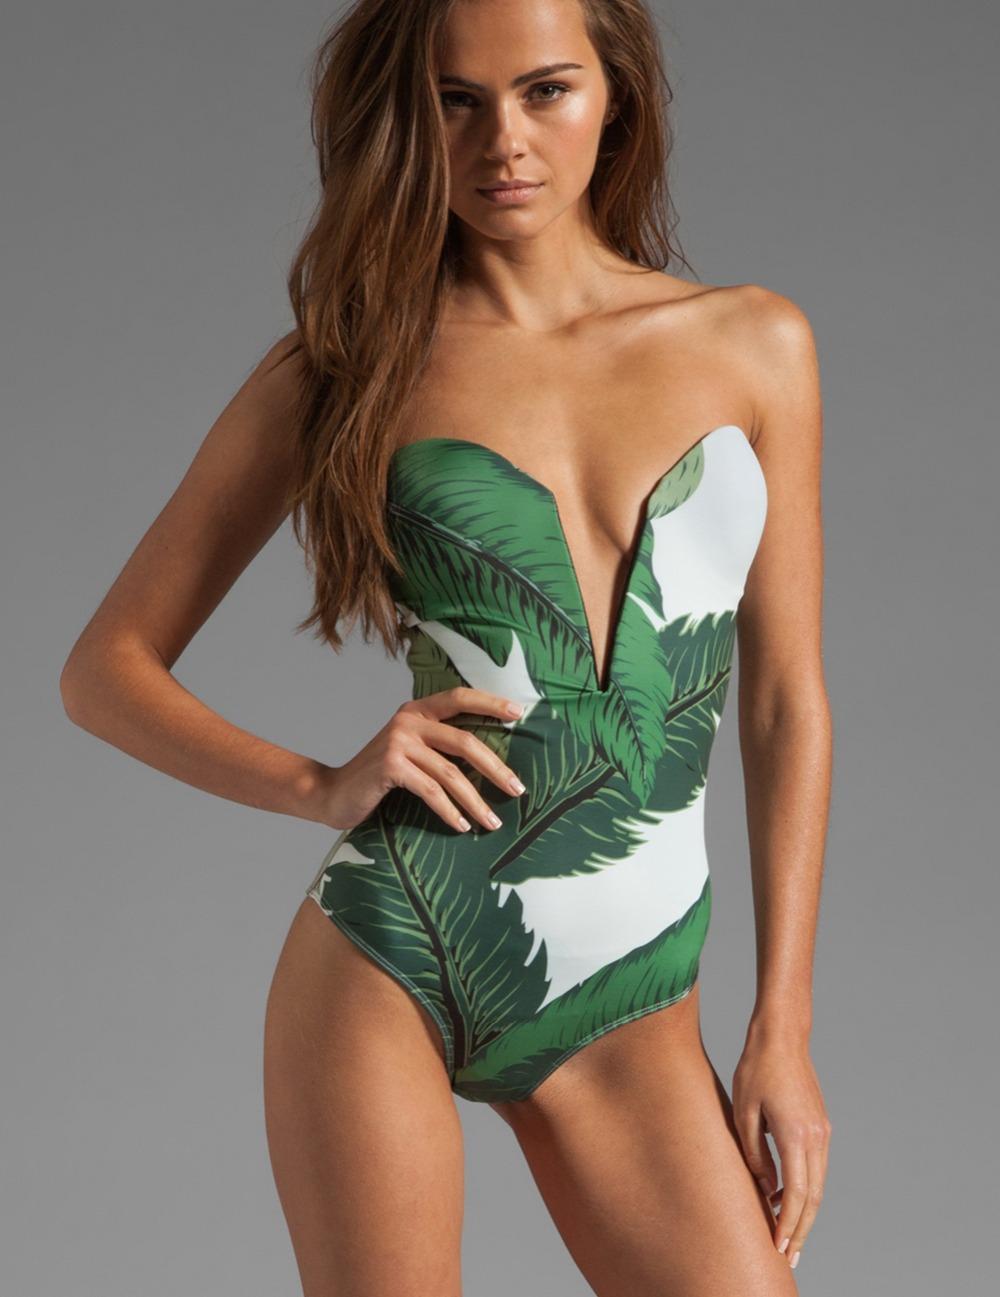 Flower Print One Piece Strapless Sexy Swimwear Green Brazilian Swimsuit Deep V Neck Bathing Suit 2016 Summer Fashion(China (Mainland))